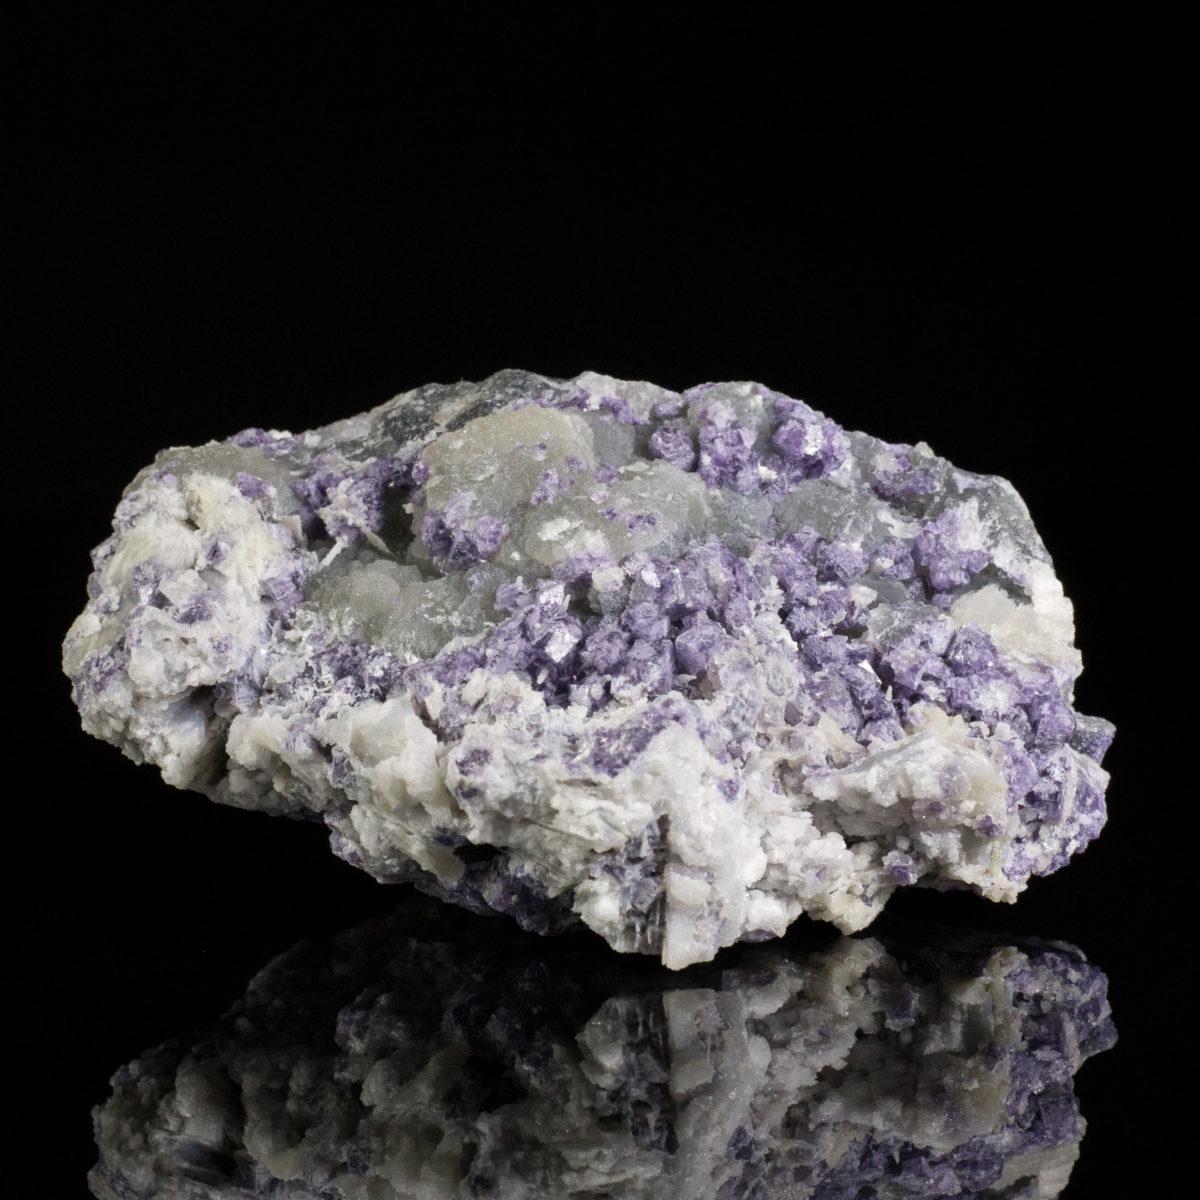 Purple Fluorite on Barite after Laumontite